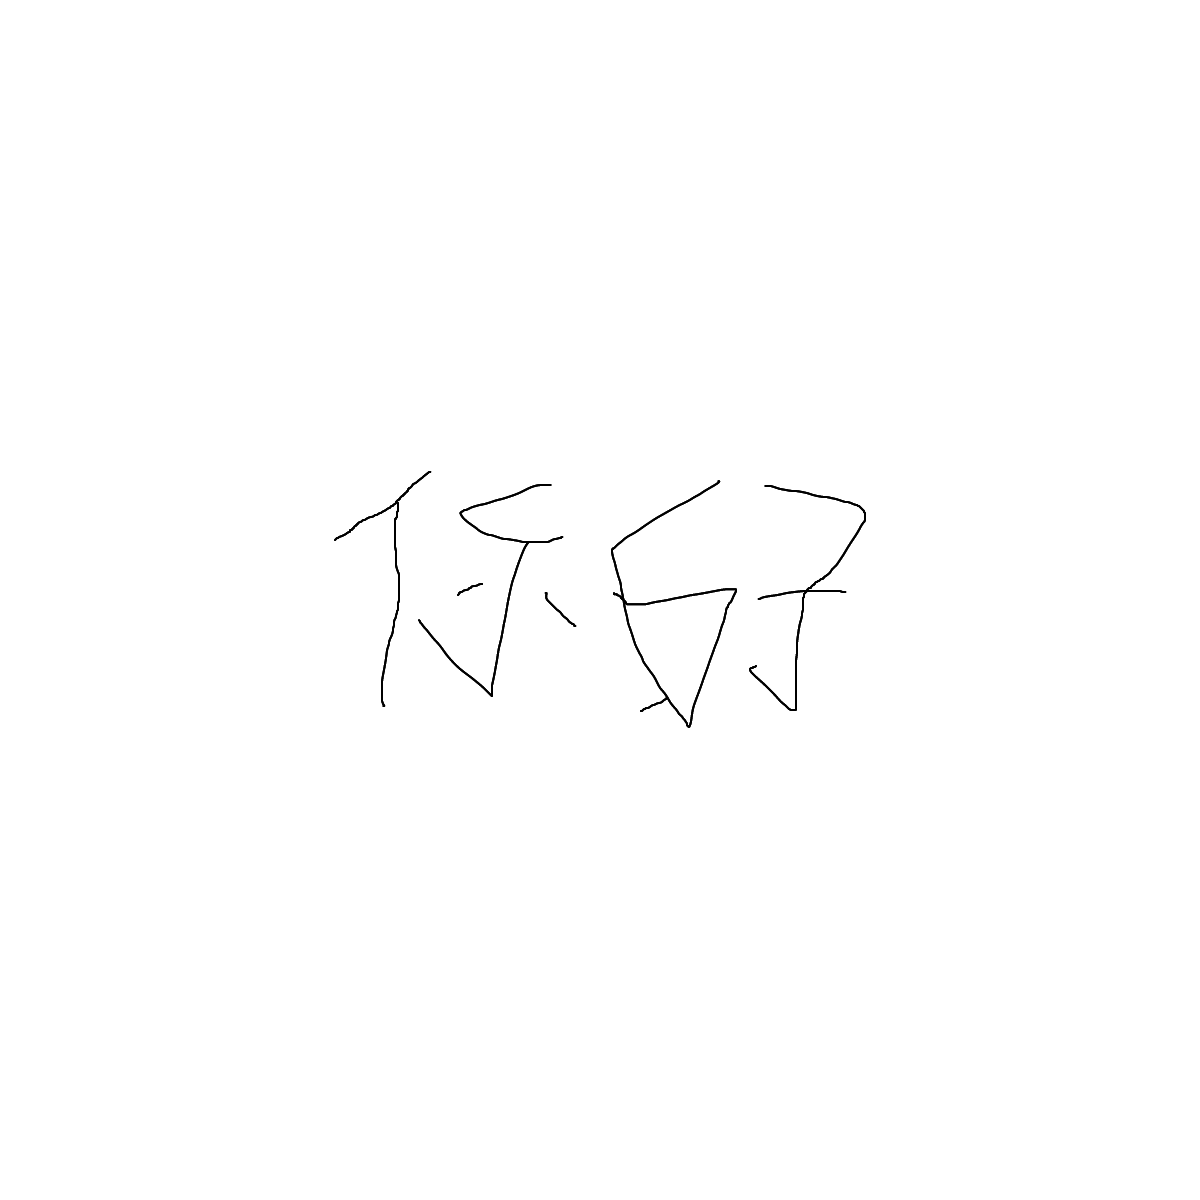 BAAAM drawing#7477 lat:29.0333614349365230lng: 103.2701034545898400